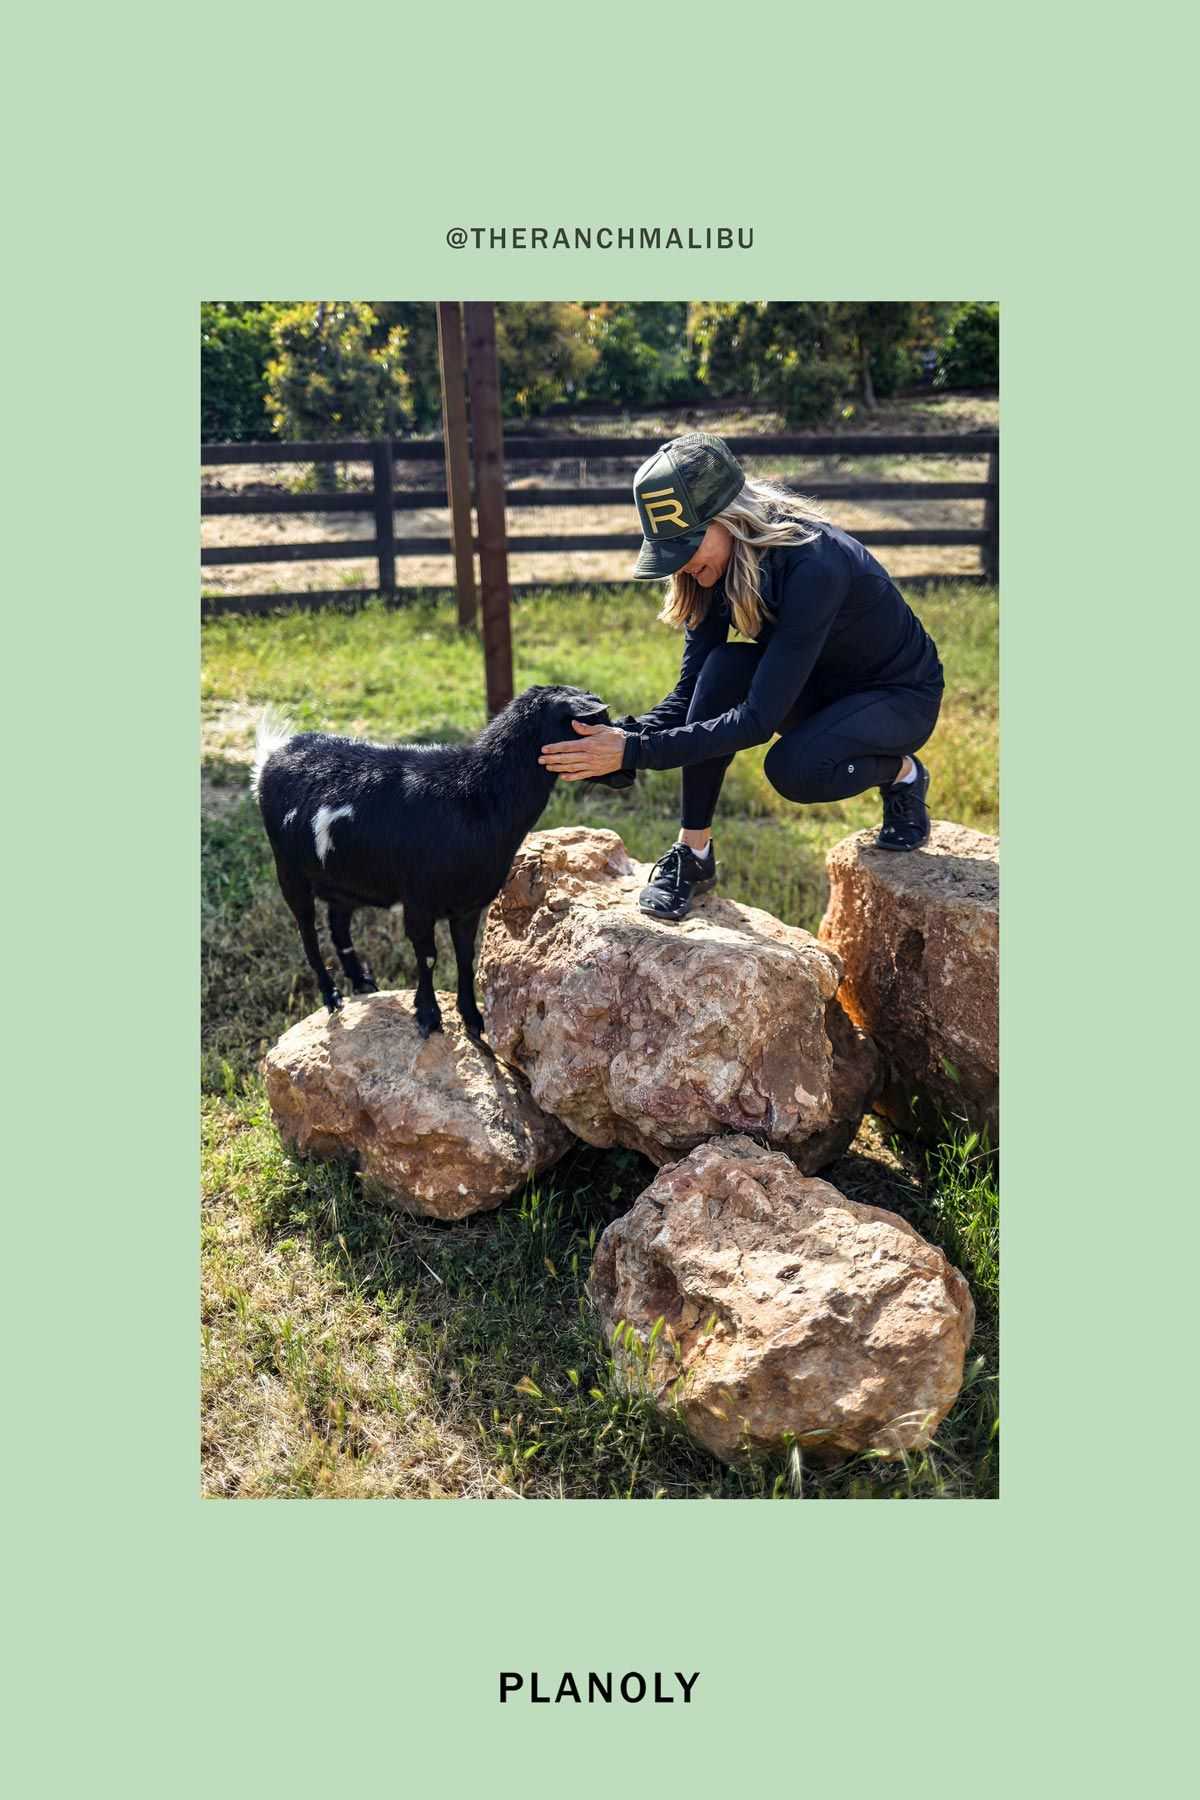 PLANOLY-Blog-Post-The-Ranch-Malibu-Image-5